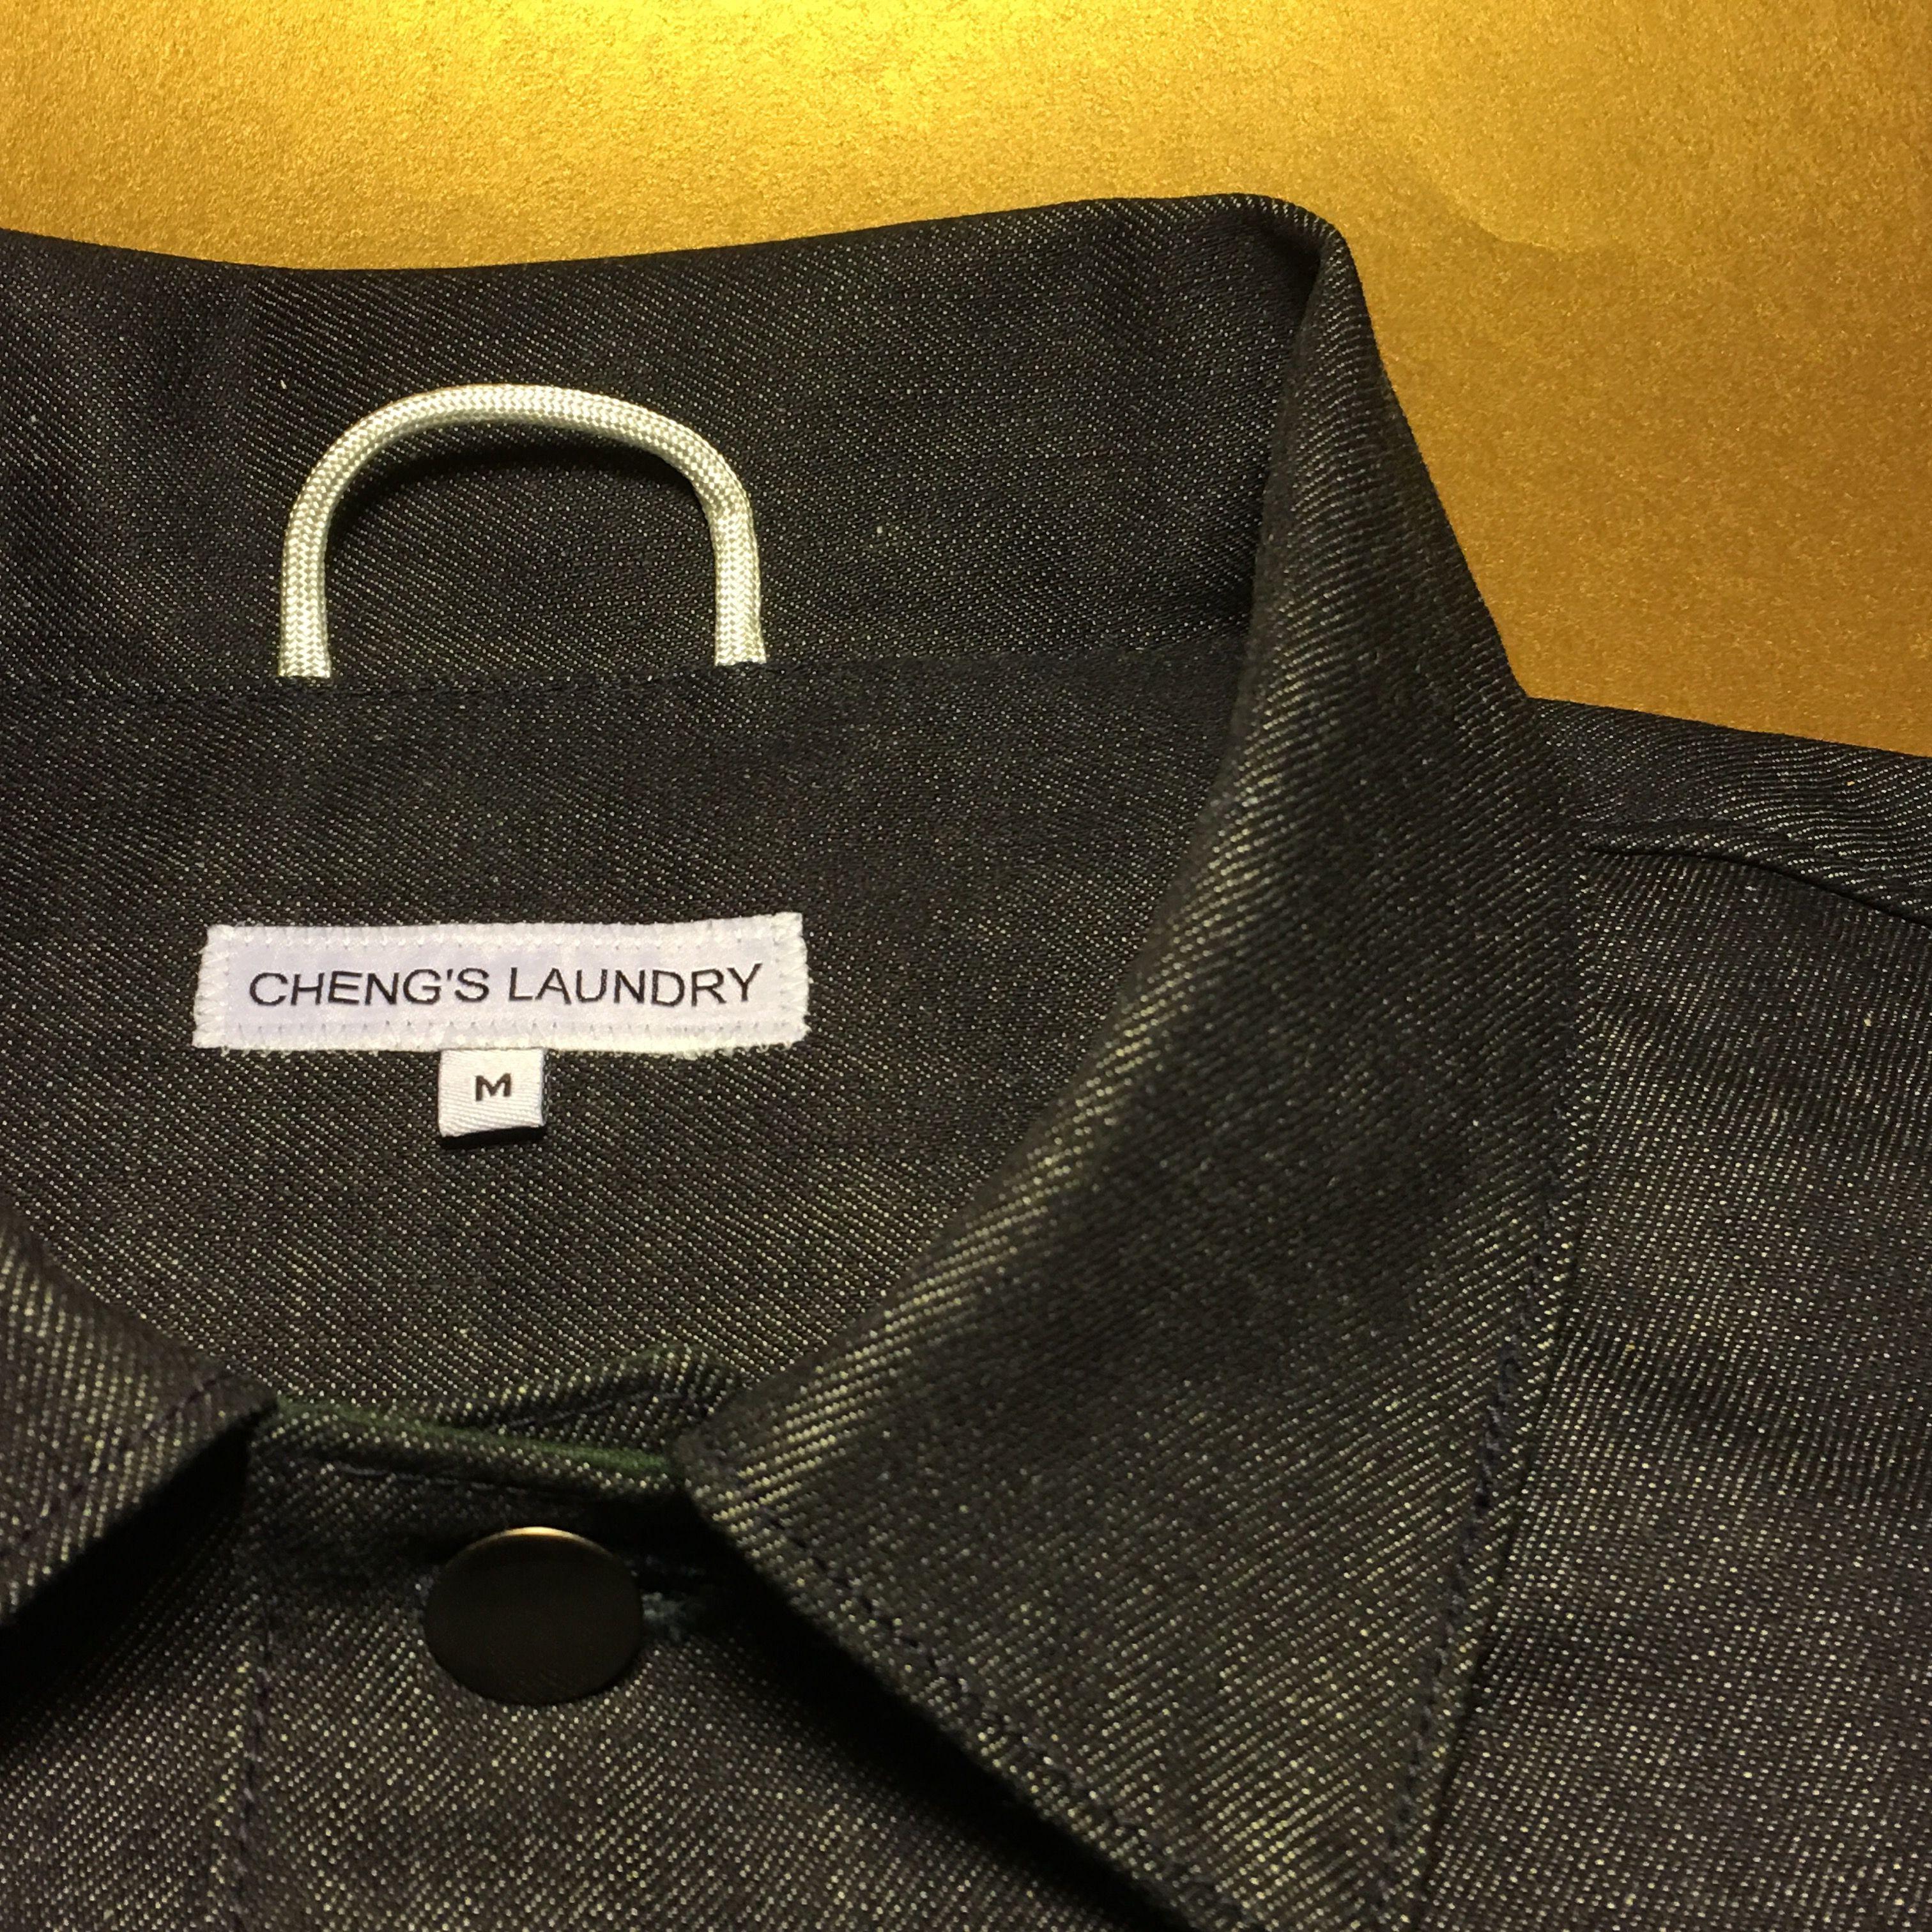 Label Placement details under the collar on this raw denim classic.  Operator #Jacket #RawDenim  Regular #Fit - #ConeMills #Indigo #vermont #madeinamerica #menswear #fashion #workwear #material #fabric